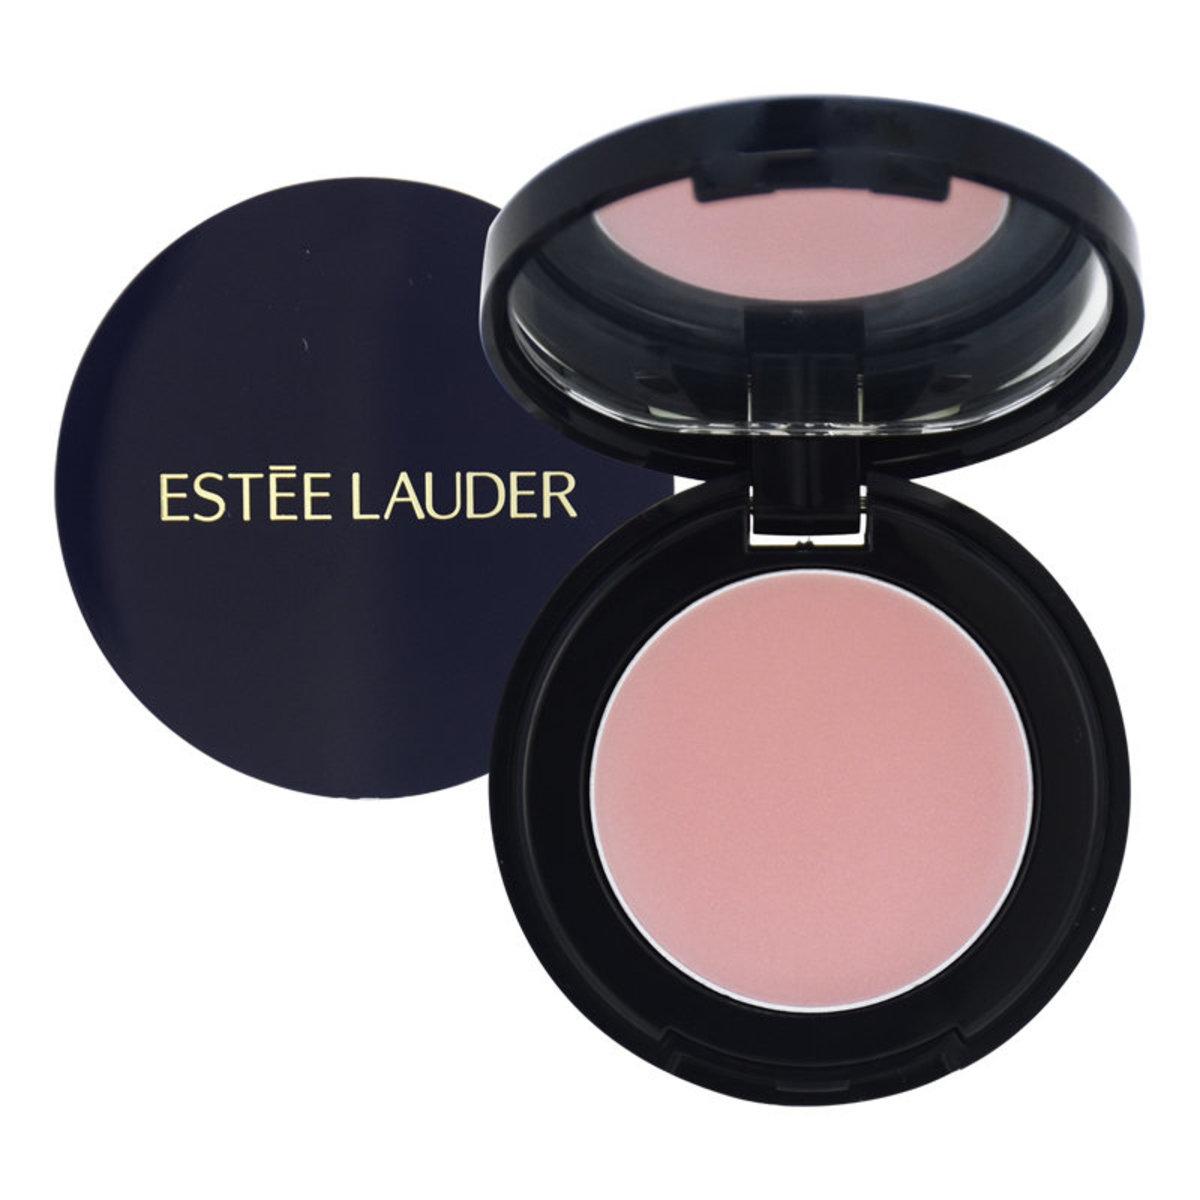 Estée Lauder   雅詩蘭黛Pure Color Envy 潤唇膏1.6g - [平行進口]   香港電視HKTVmall 網上購物